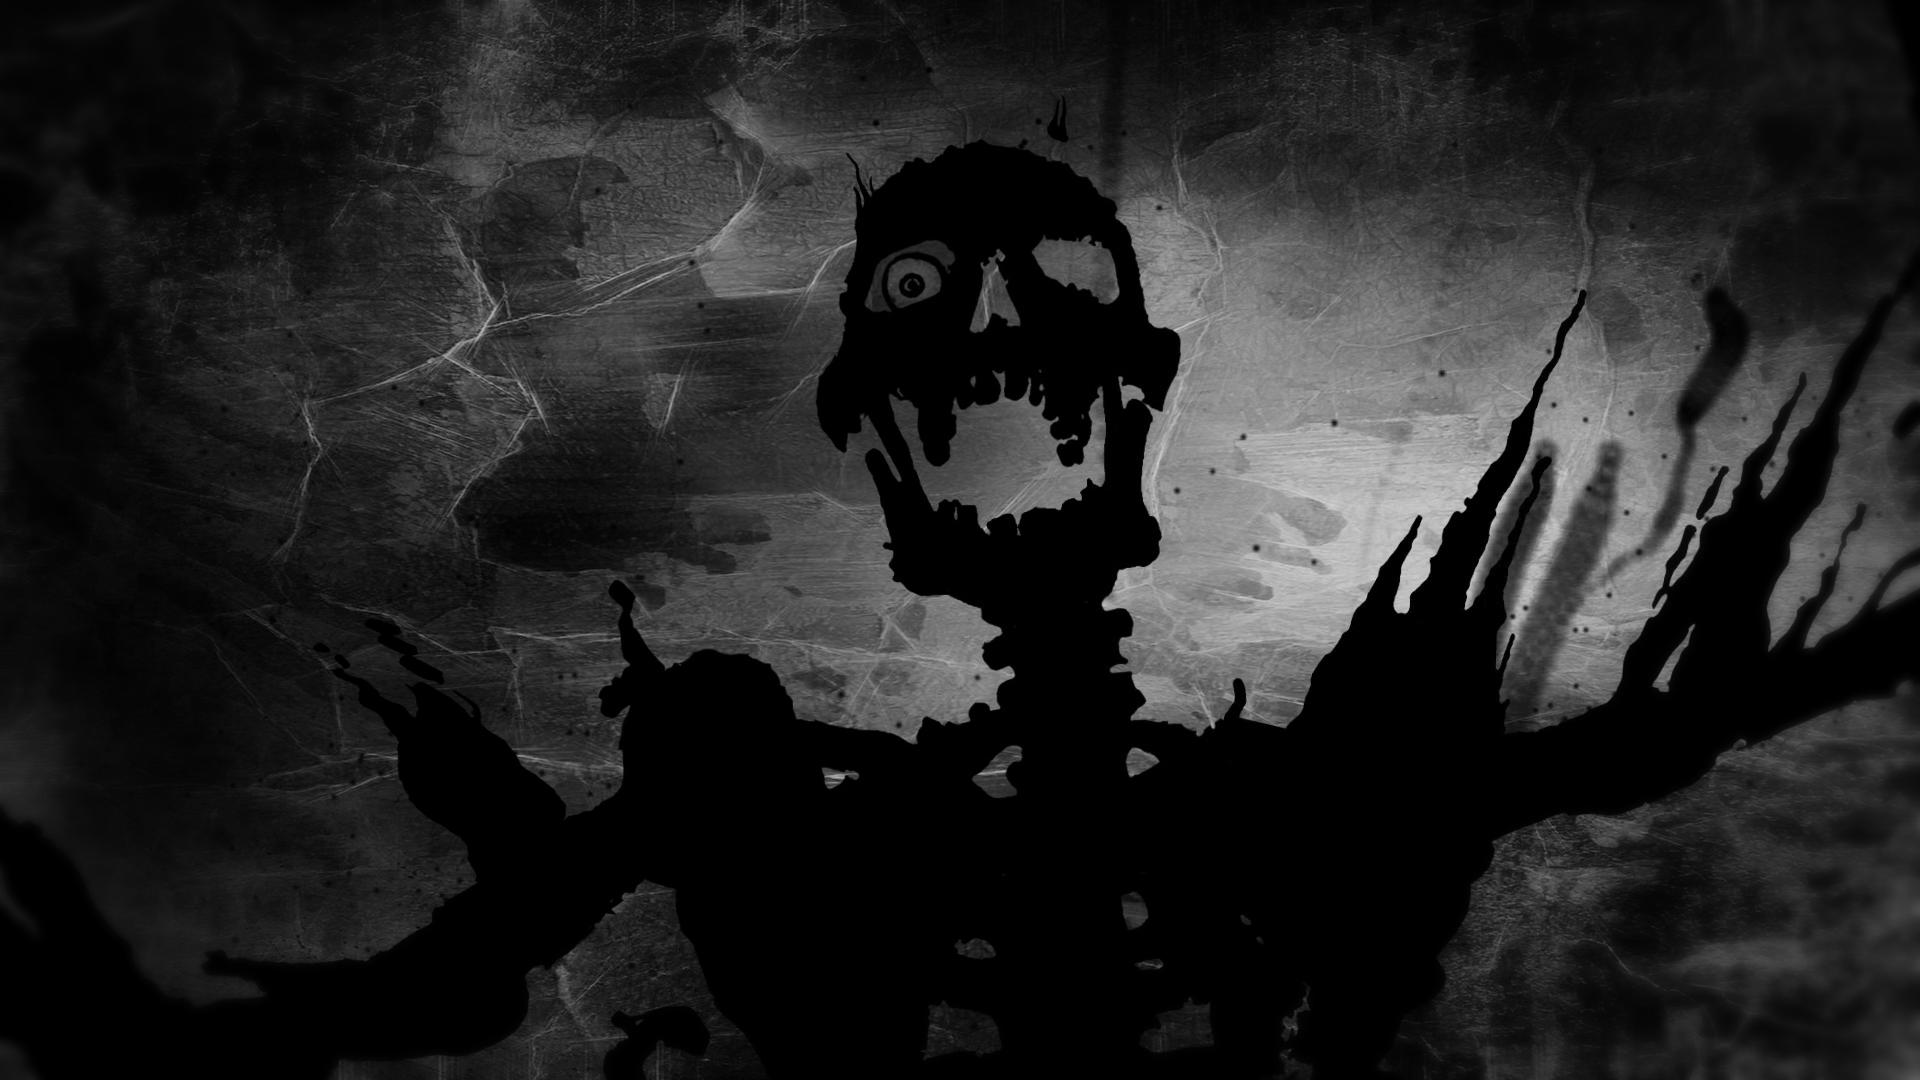 Halloween Skeleton Wallpaper.Free Download Dark Skulls Skull Evil Halloween Scream